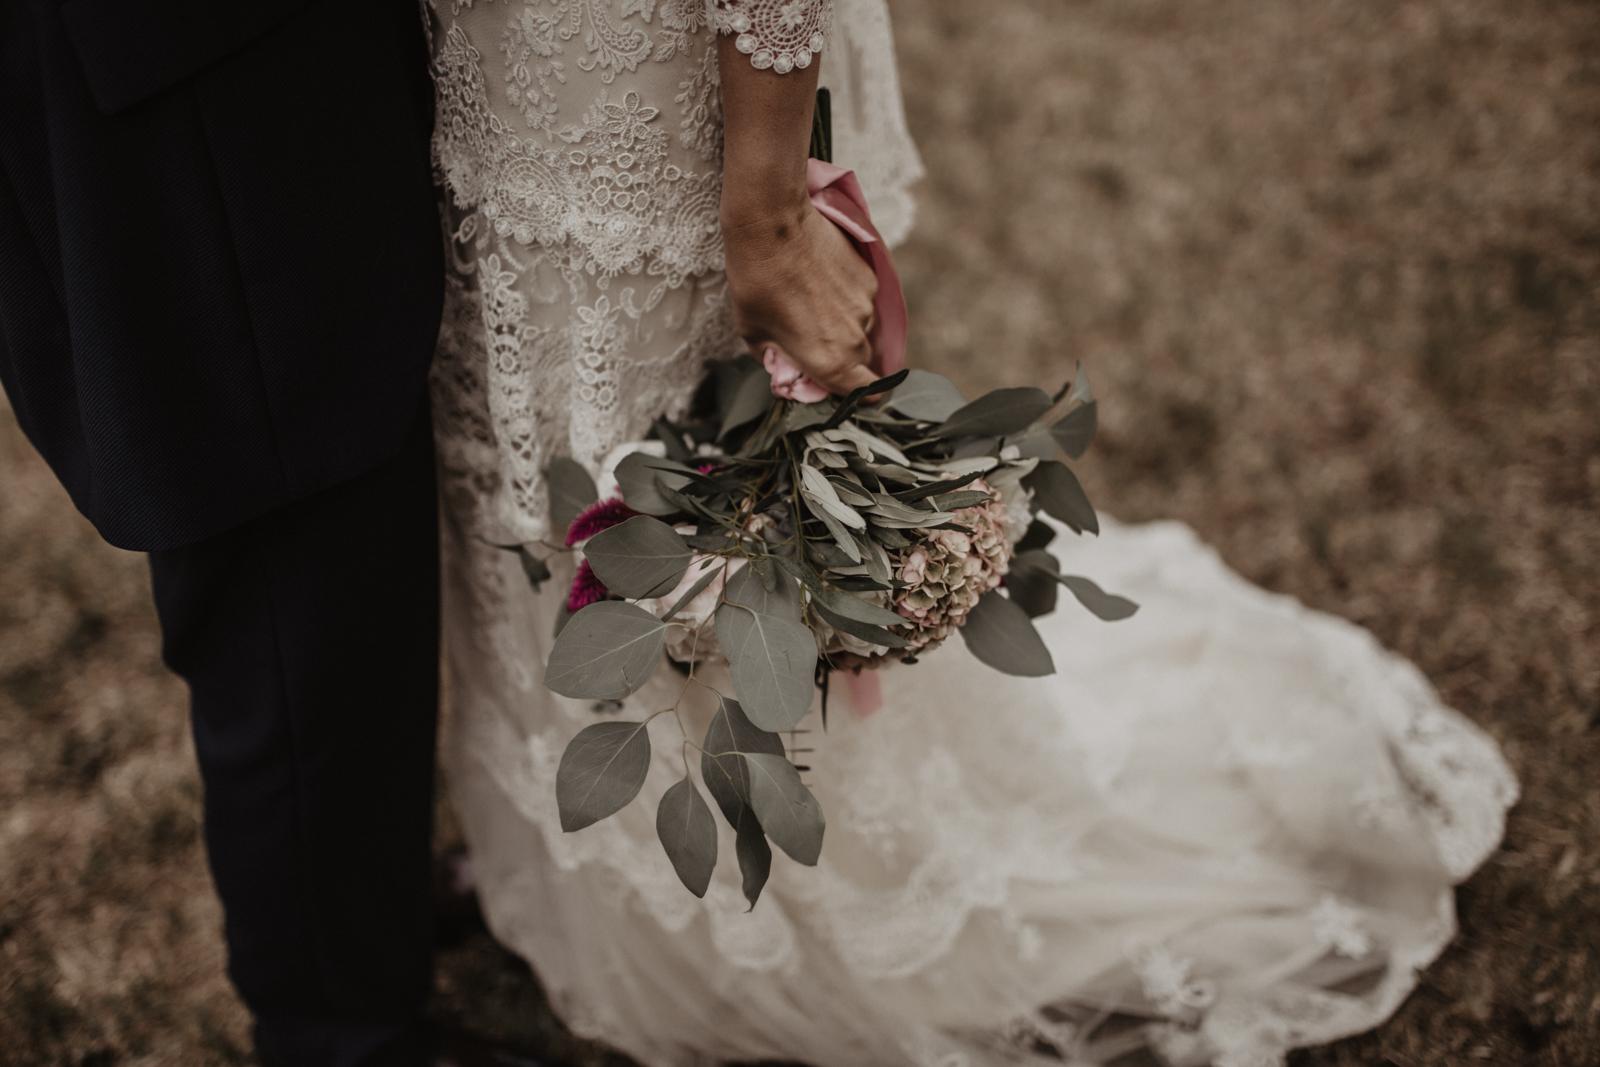 thenortherngirlphotography_photography_thenortherngirl_rebeccascabros_wedding_weddingphotography_weddingphotographer_barcelona_bodaenbarcelona_bodaenmaselmarti_bodarogeryvane-524.jpg